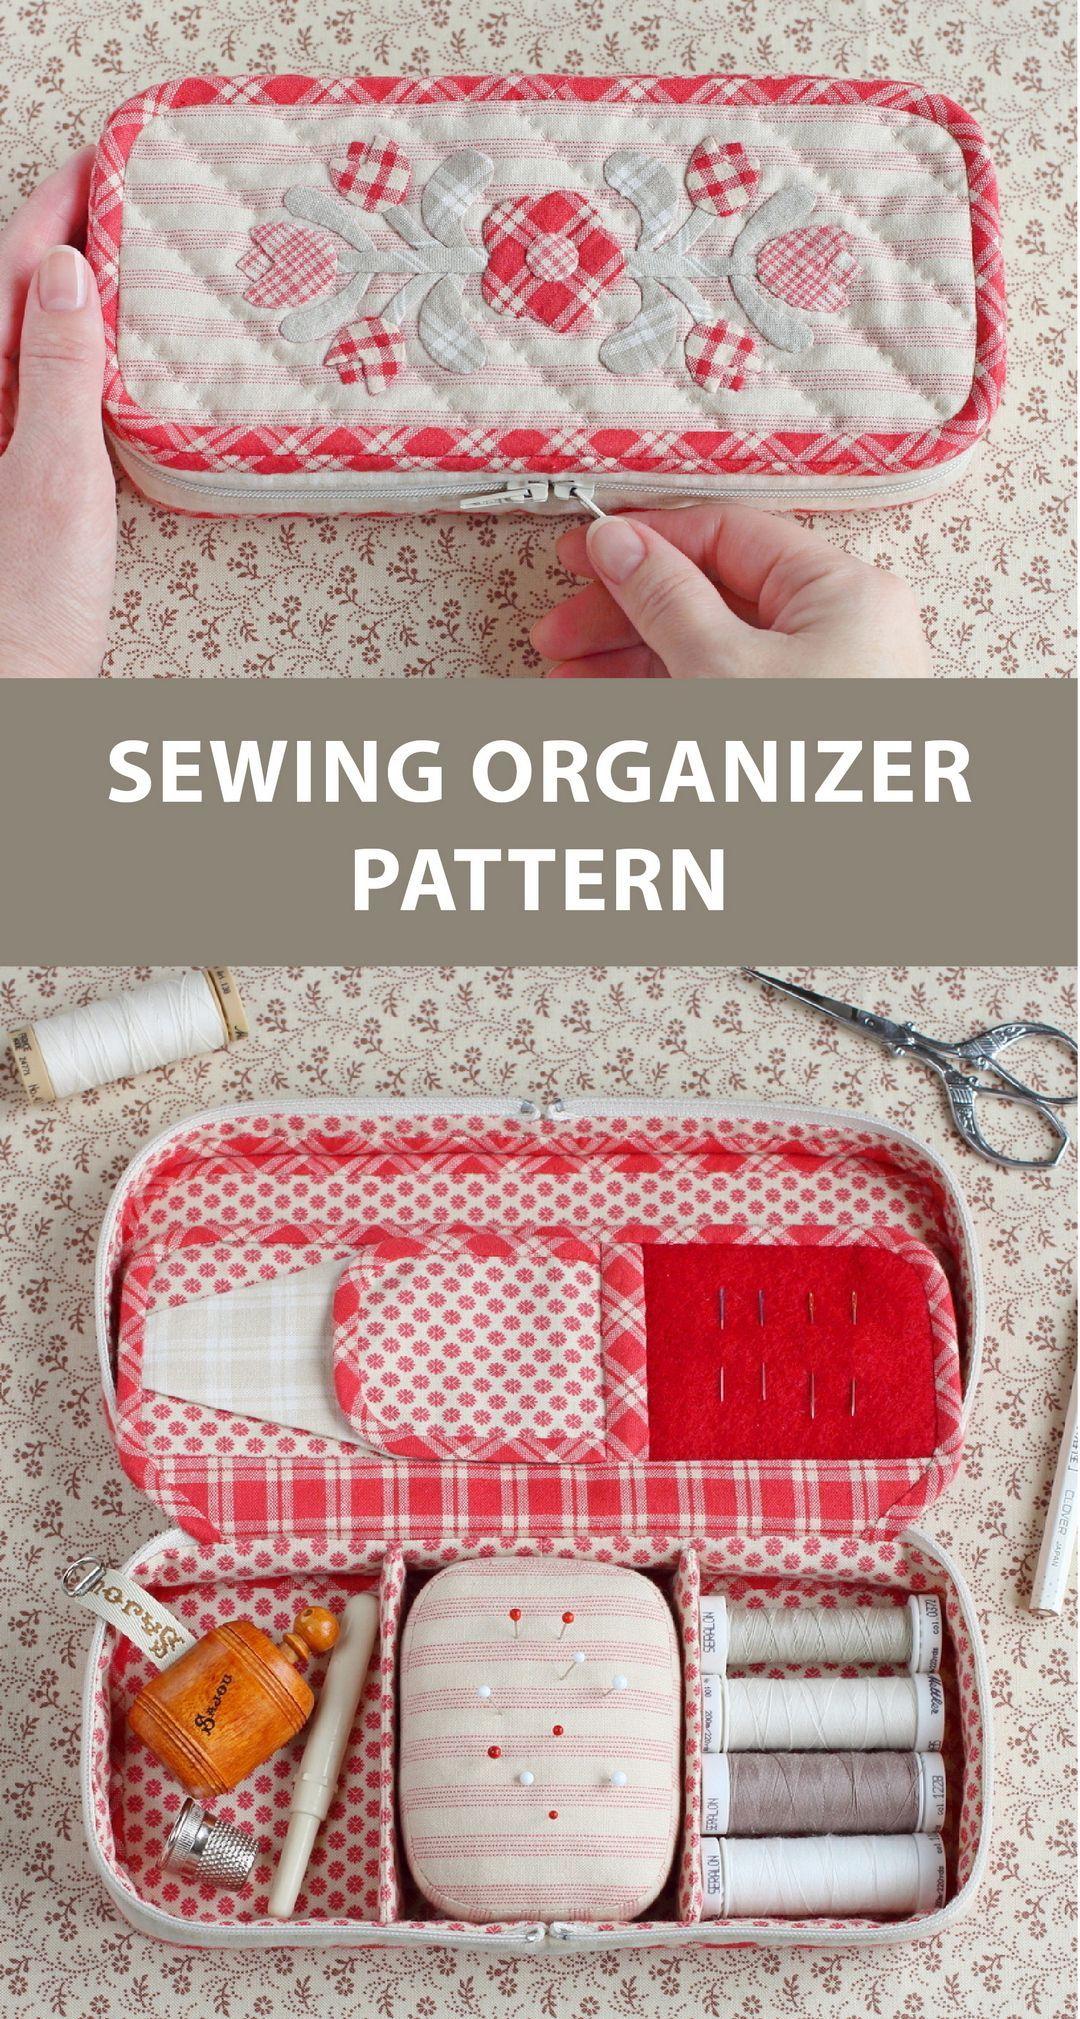 Patrón De Costura Pdf Tutorial De Costura Patrón De Kit De Costura De Viaje Patrón Organiza Sewing Kit Pattern Sewing Kit Organizer Sewing Organizer Pattern